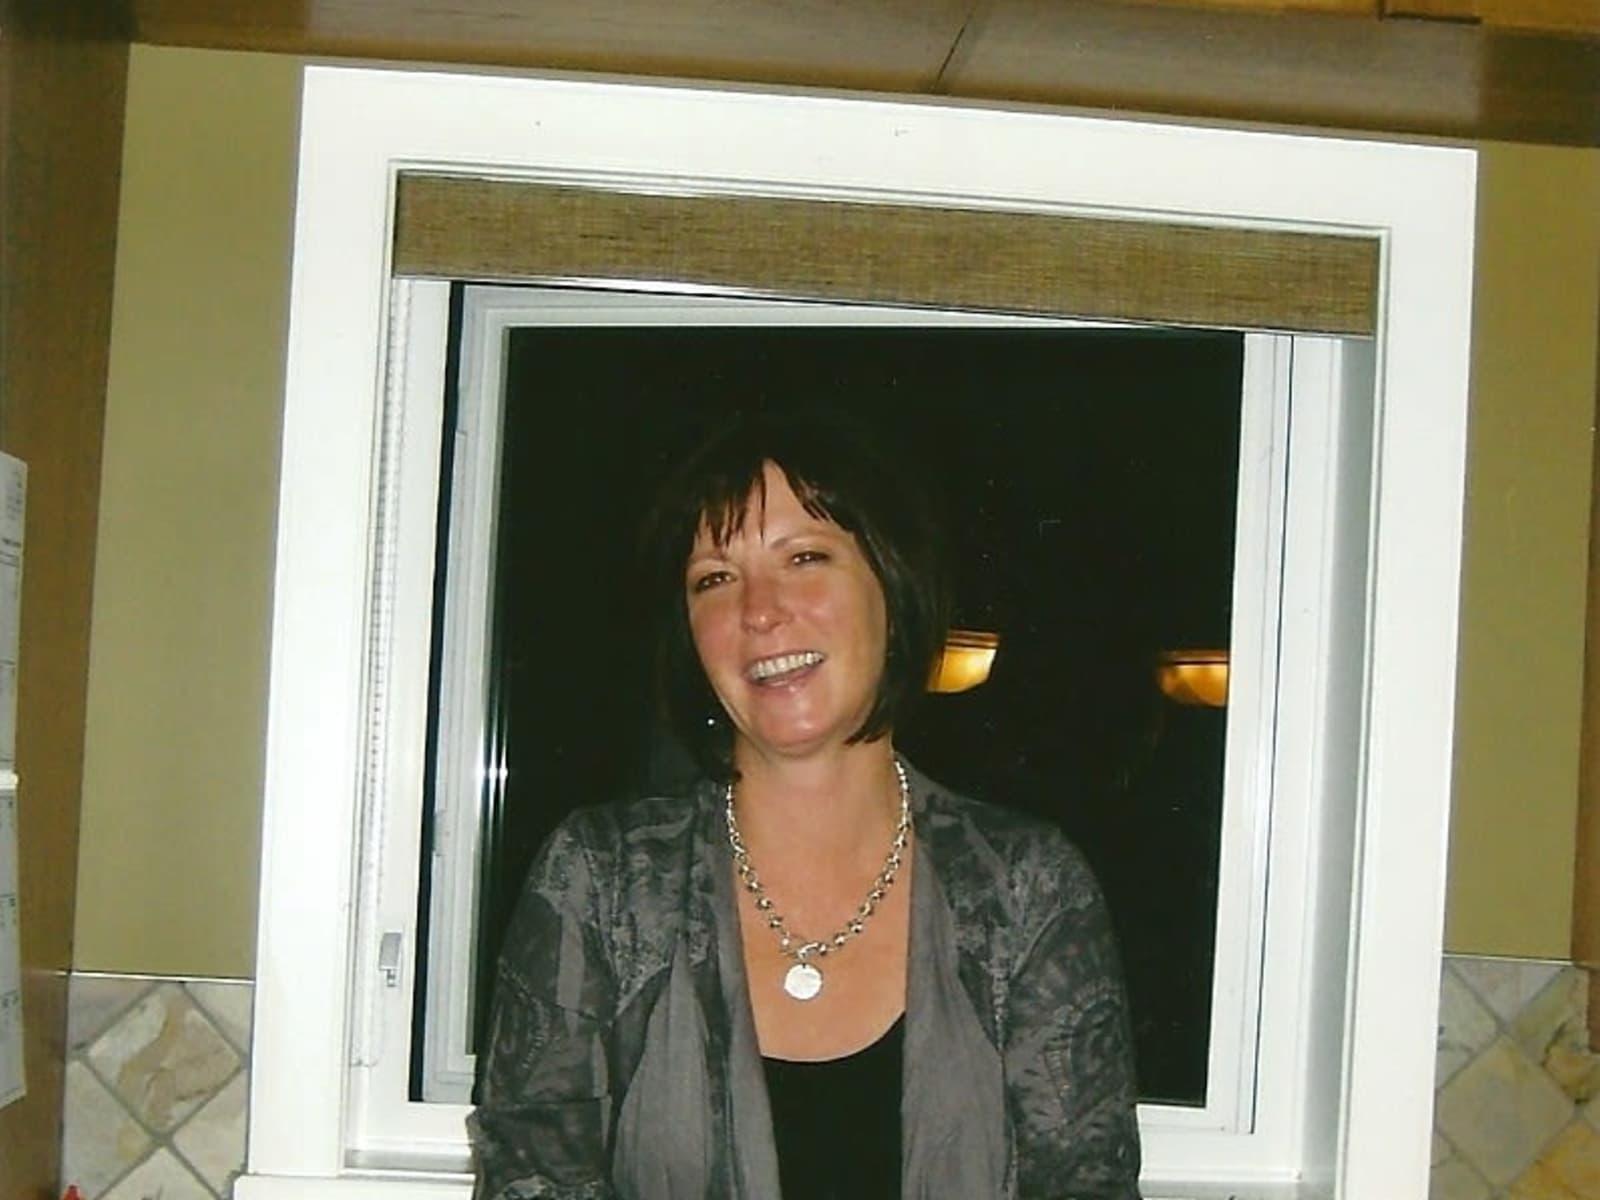 Kimberly from Winnipeg, Manitoba, Canada